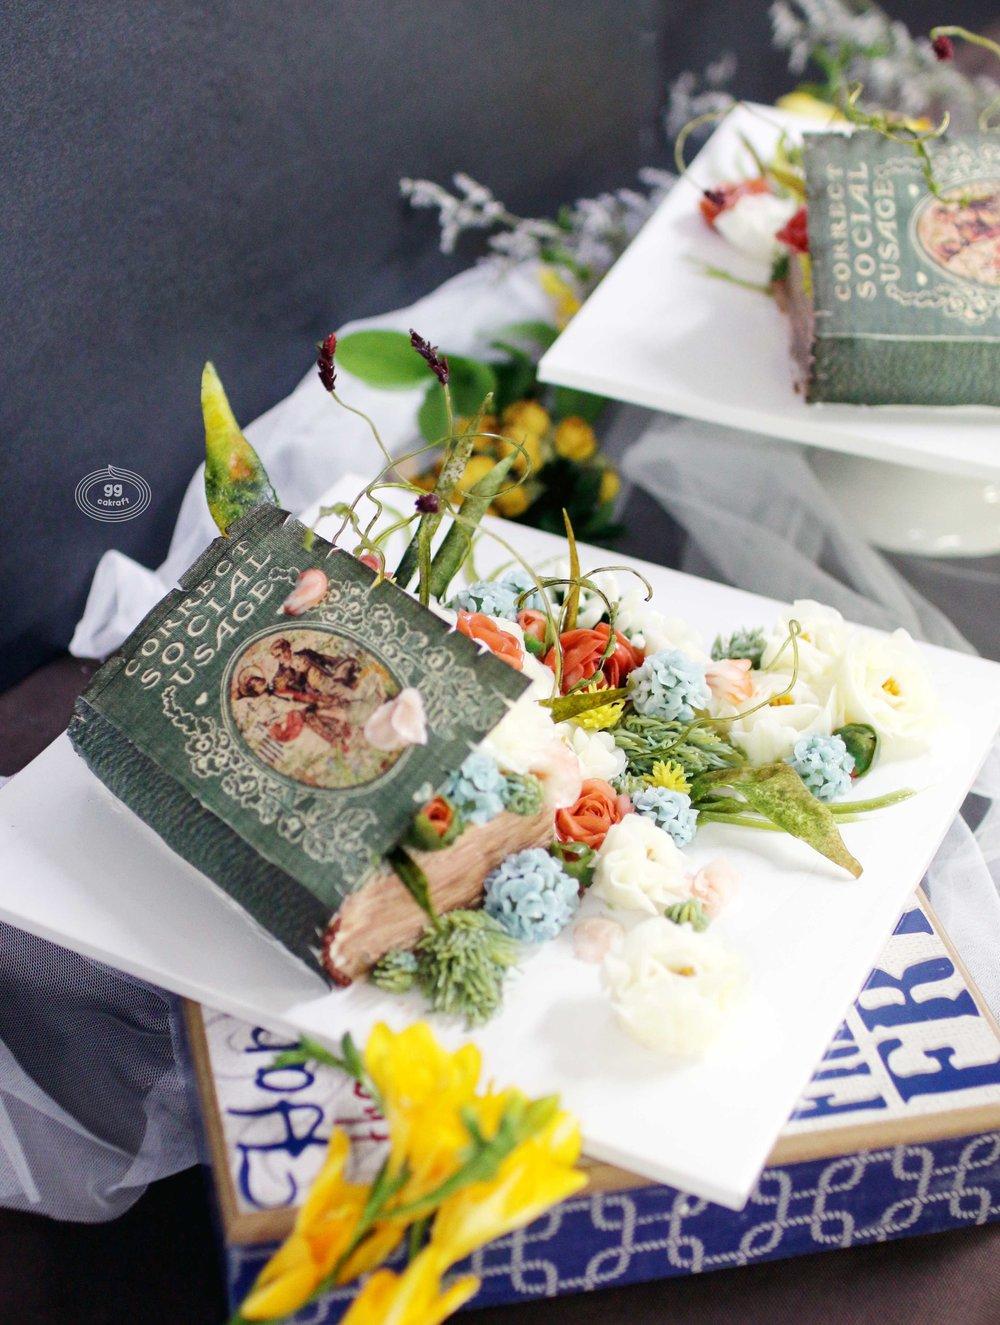 Day 4. Book cake   - Flower piping : Open-Peony, Closed-Peony, , Hydrangea, Delphinium, 3D stem, leaf.  - Edible bookcake